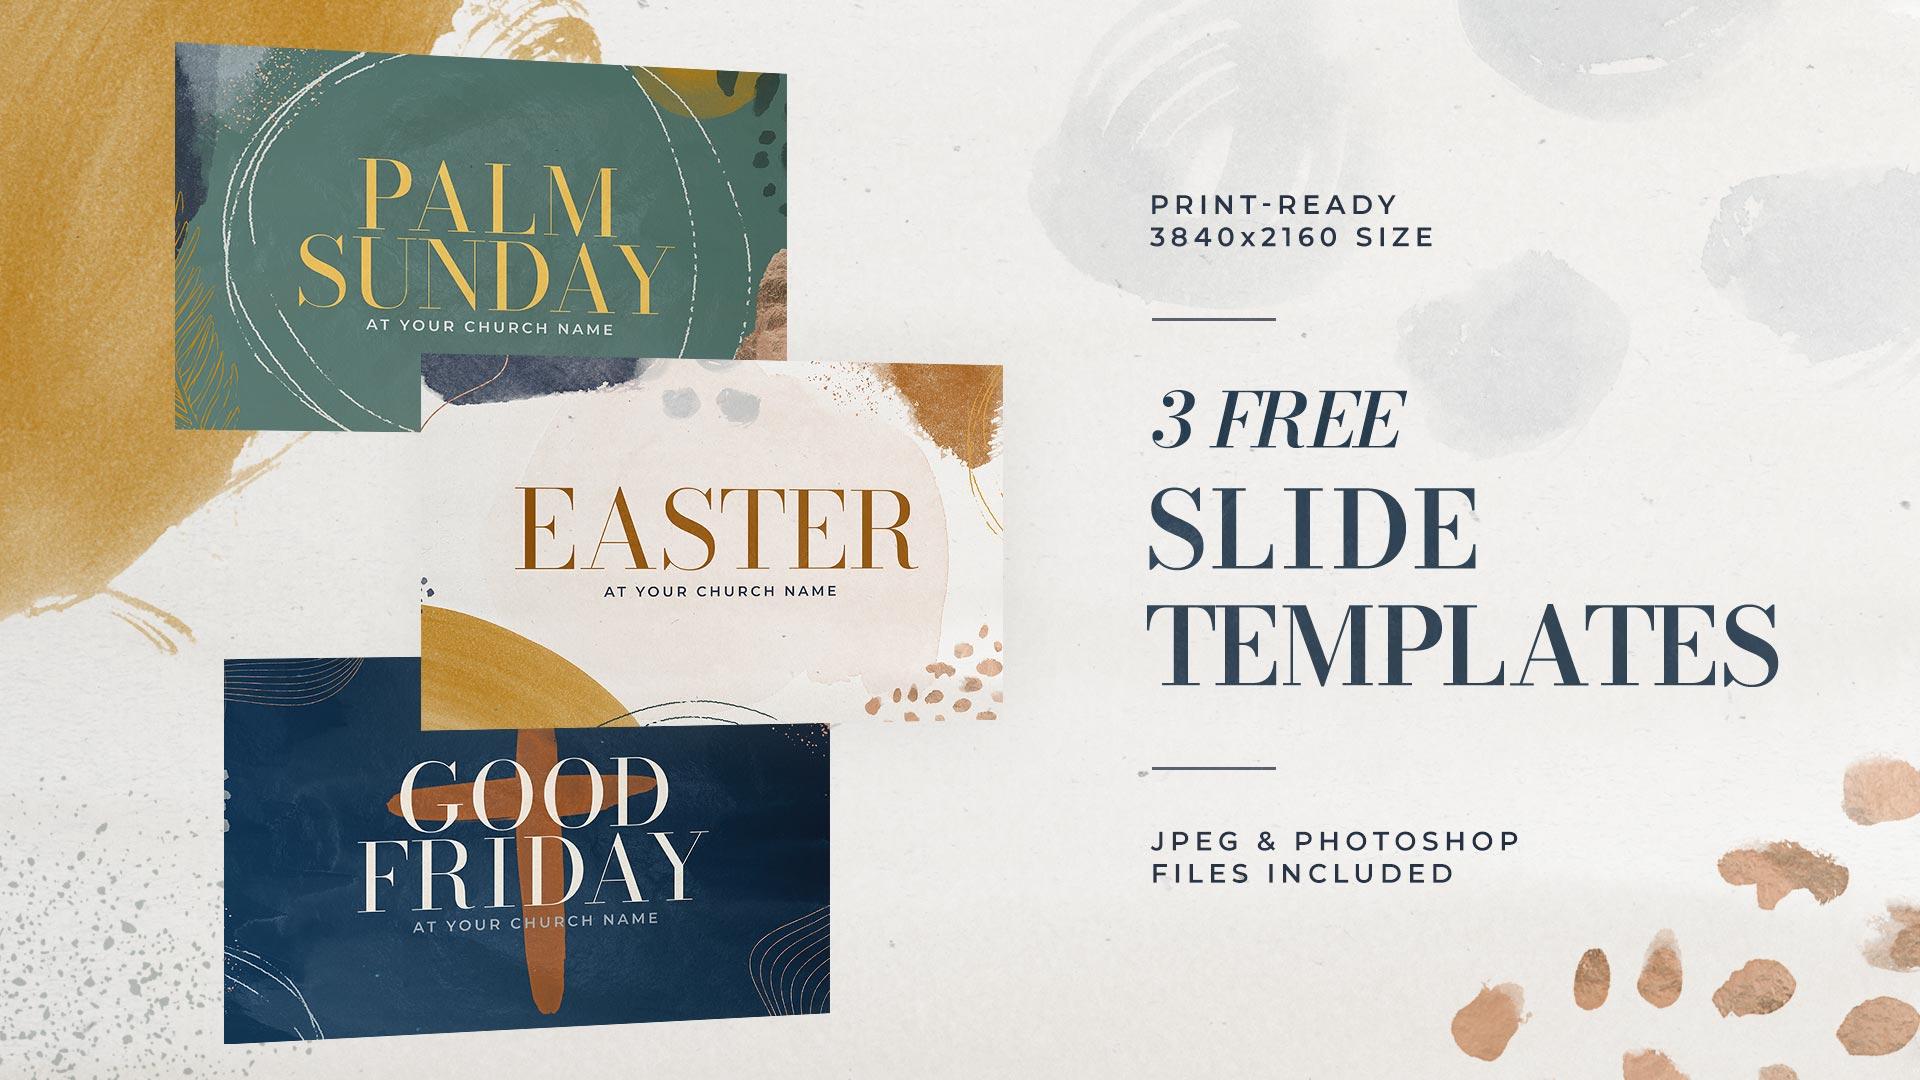 3 Free Slide Templates